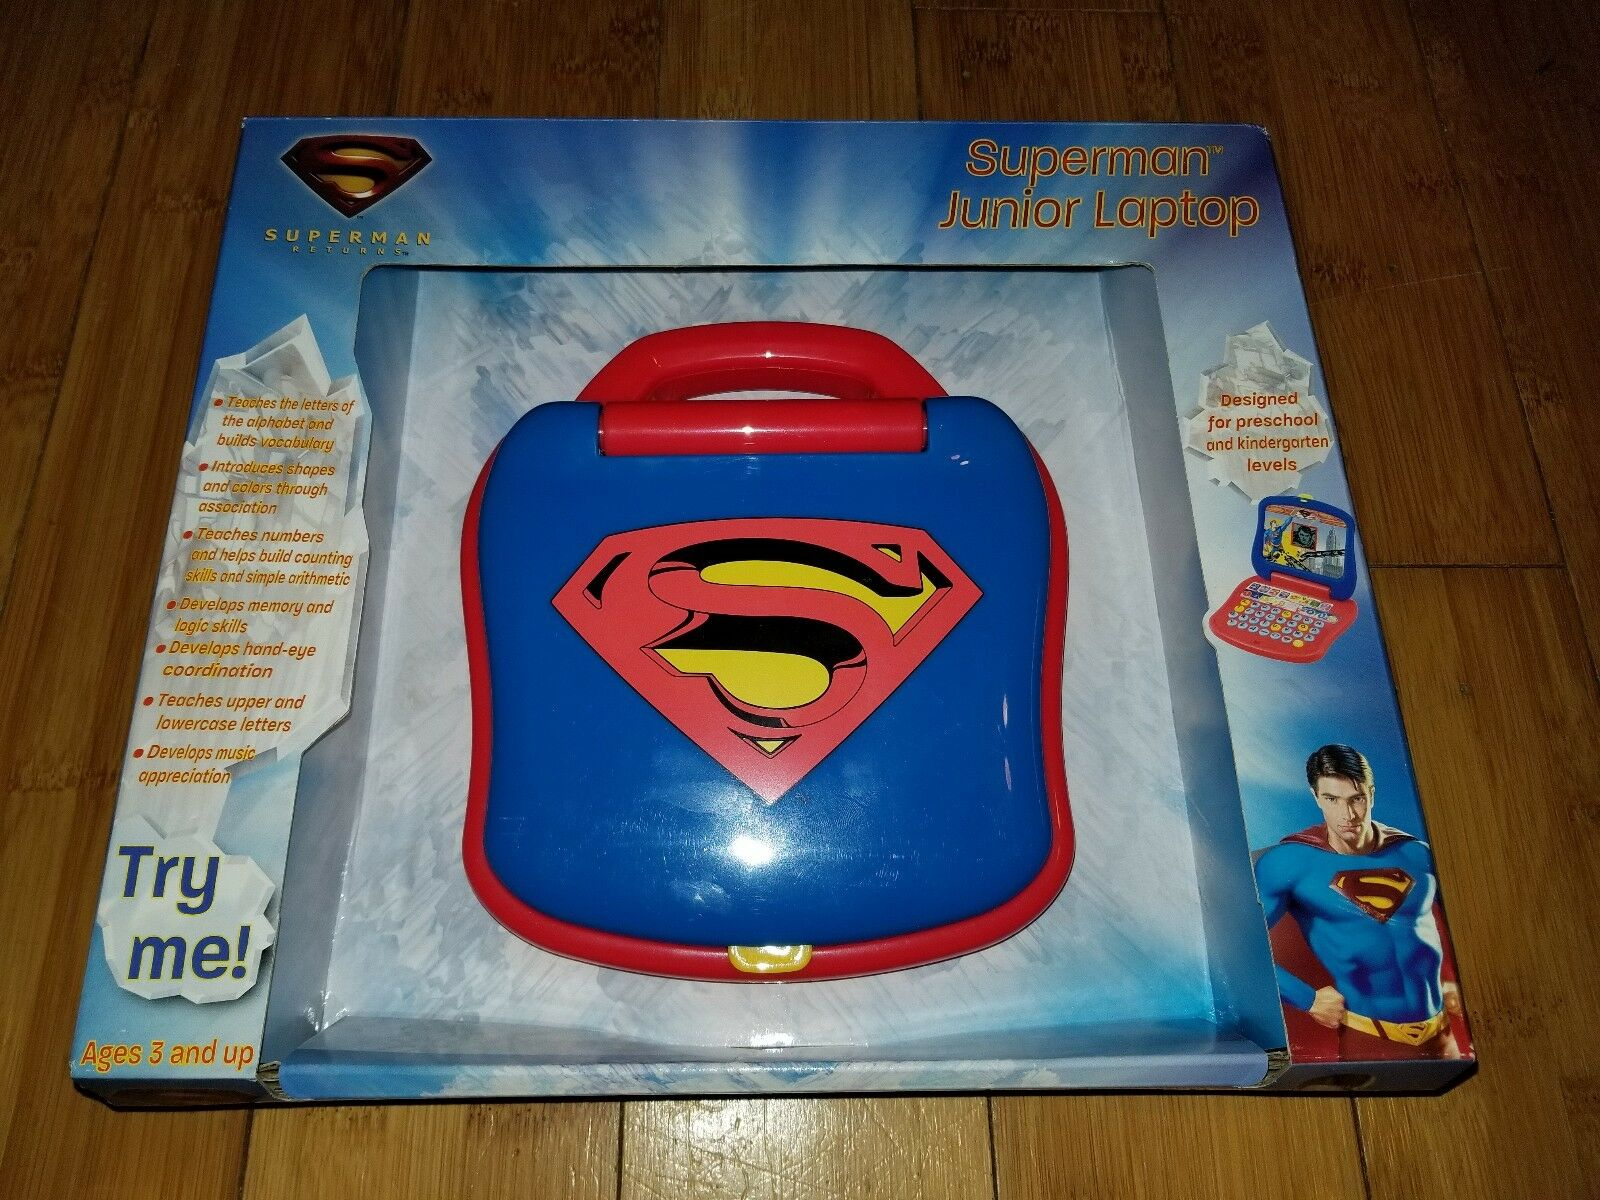 Superman Returns Kids Interactive Educational Learning Laptop Game Very Rare 1N